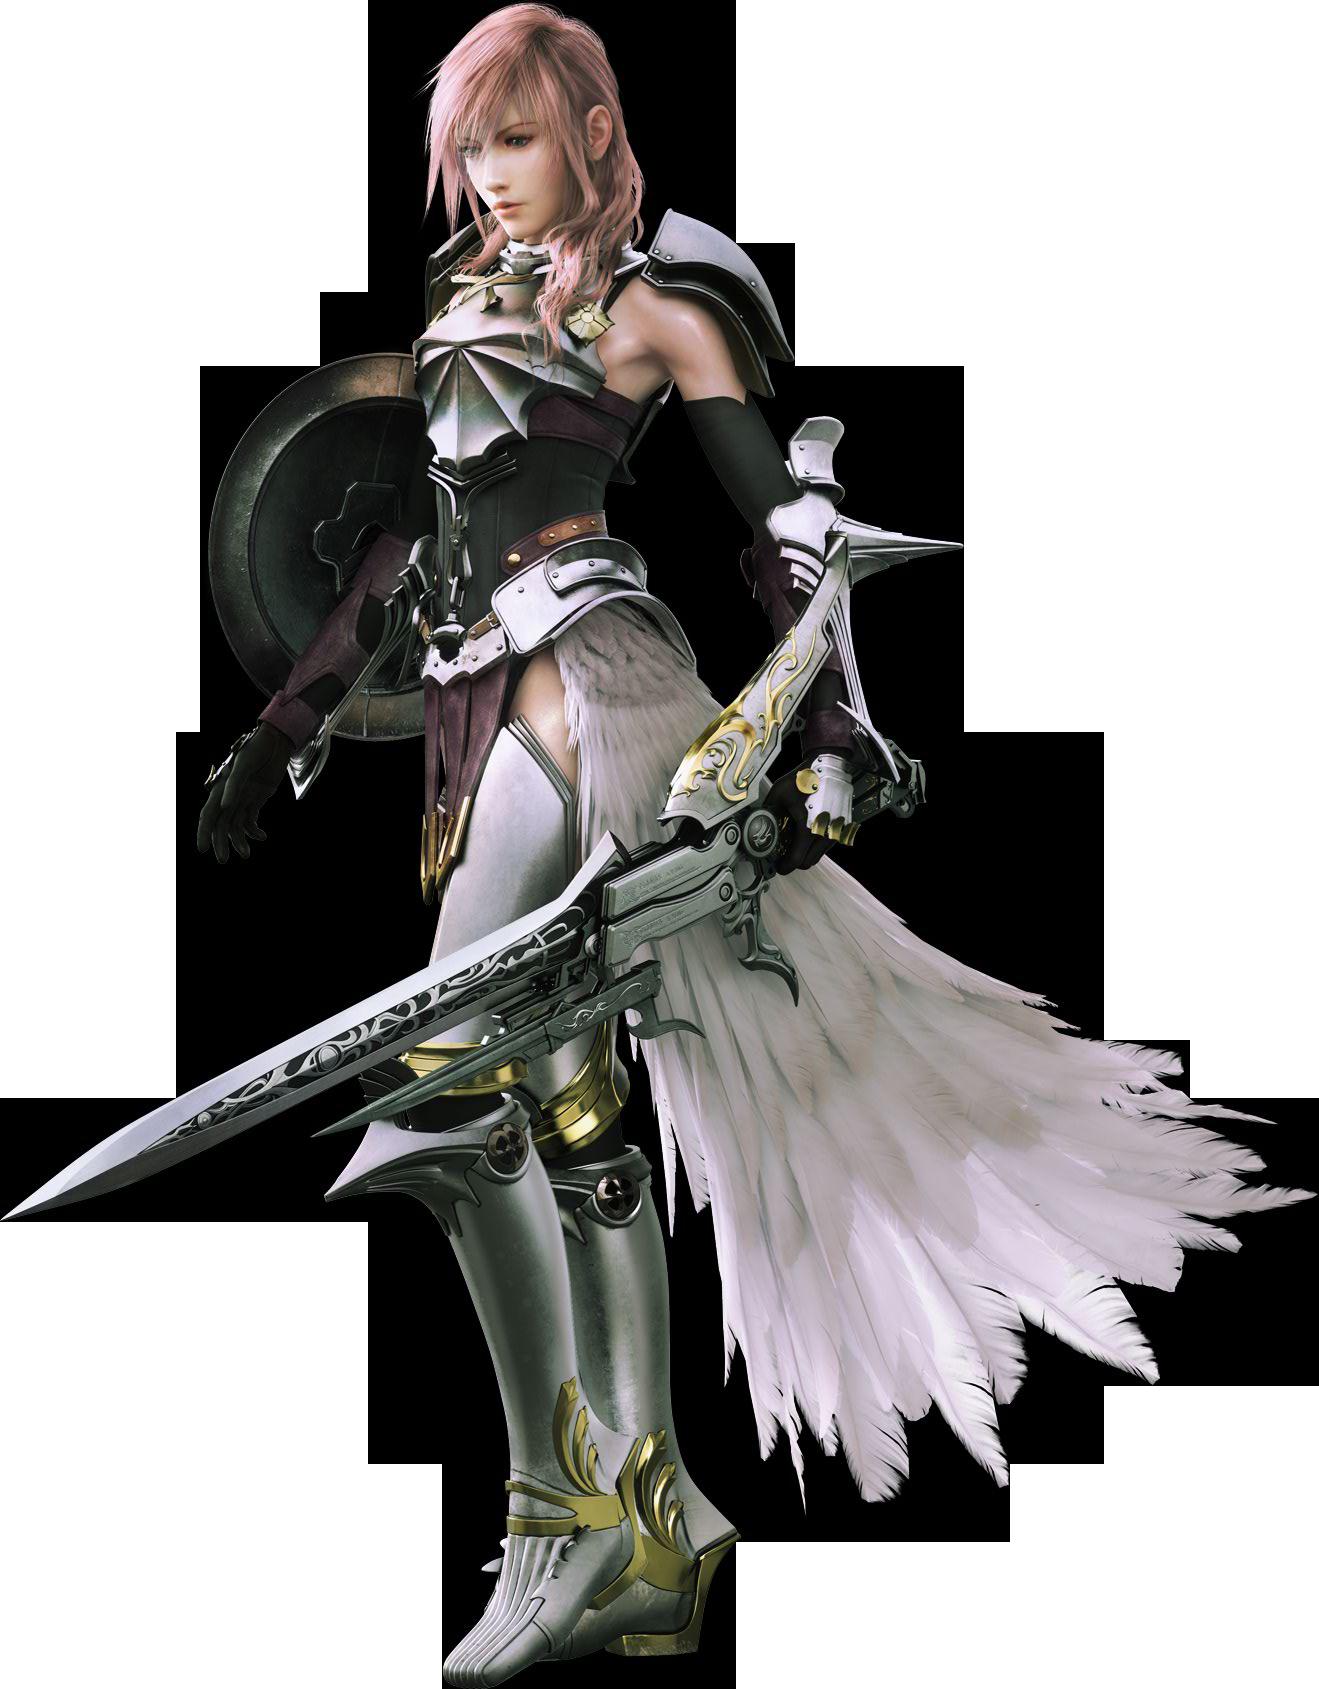 4e6dba52 Final Fantasy Xiii 2 Lightning Character Artwork Png 1319 1689 Lightning Final Fantasy Final Fantasy Girls Final Fantasy Art